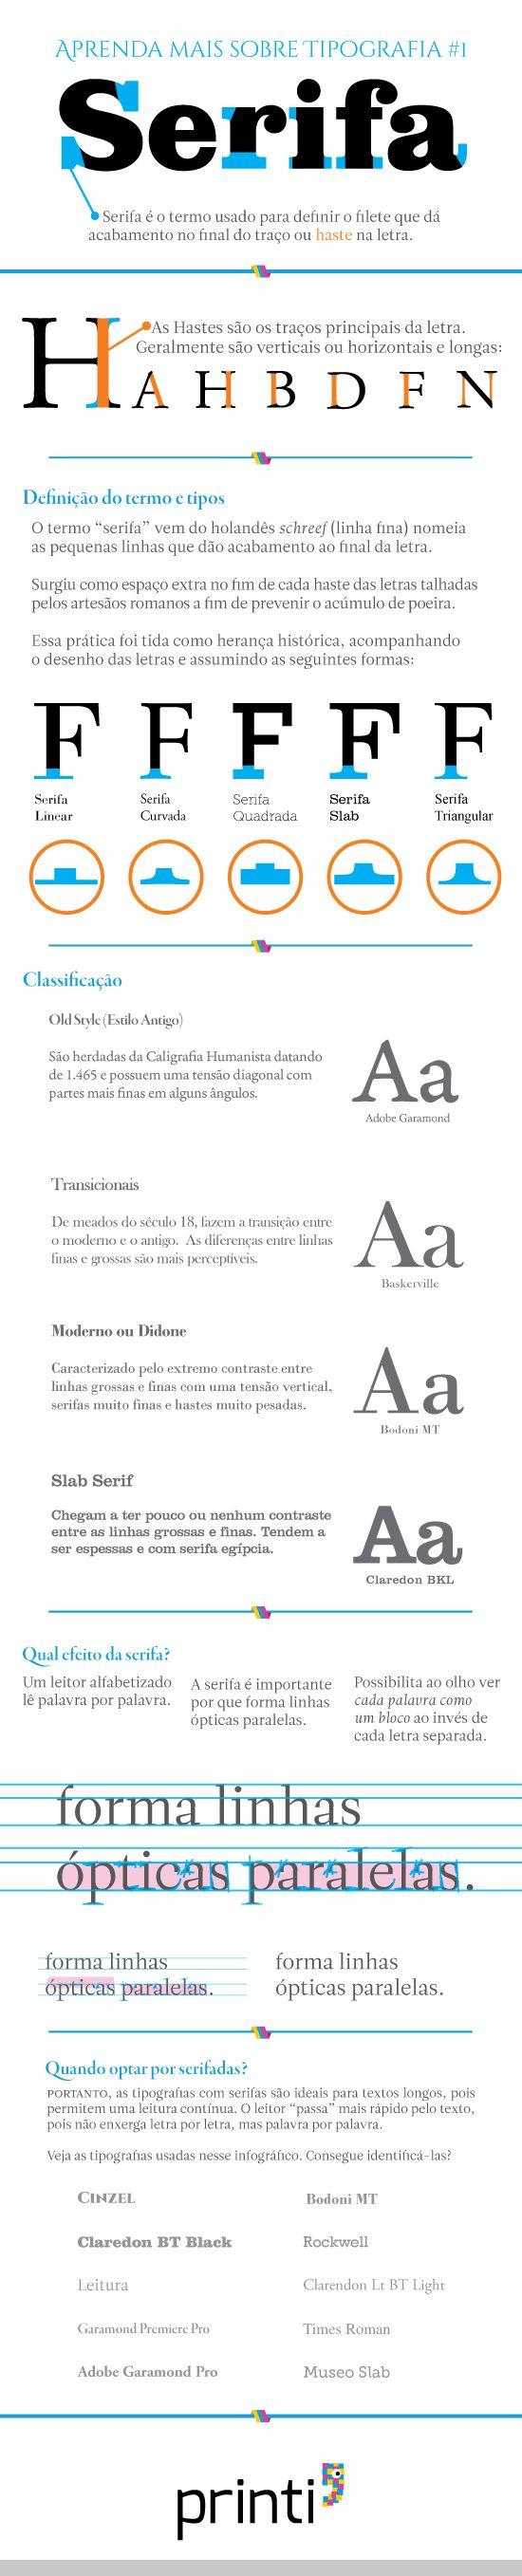 Infográfico Tipografia Serifa